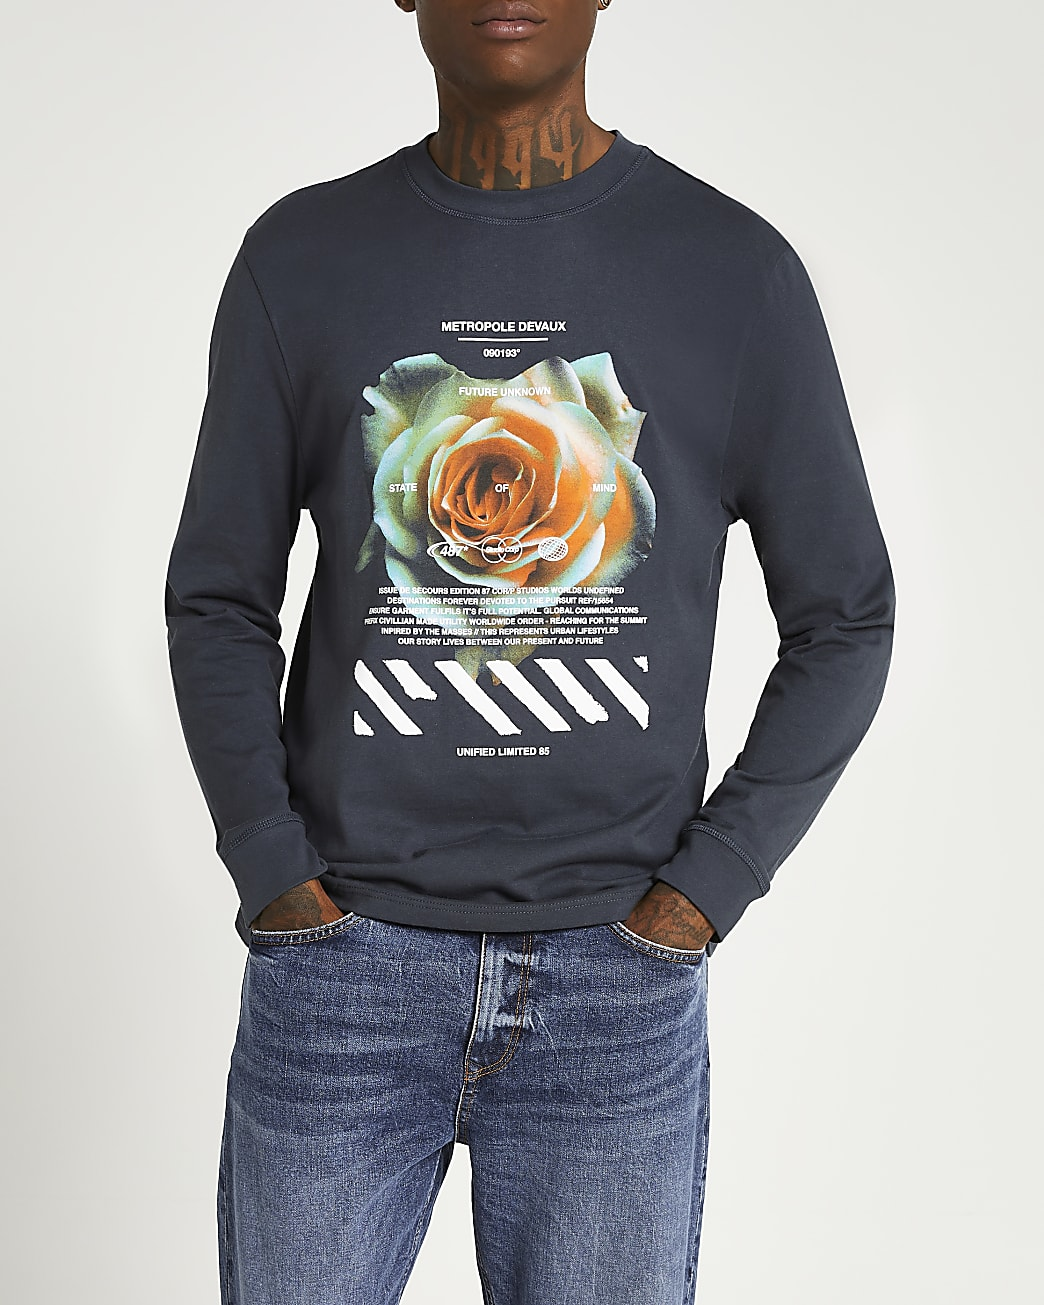 Grey regular fit long sleeve t-shirt